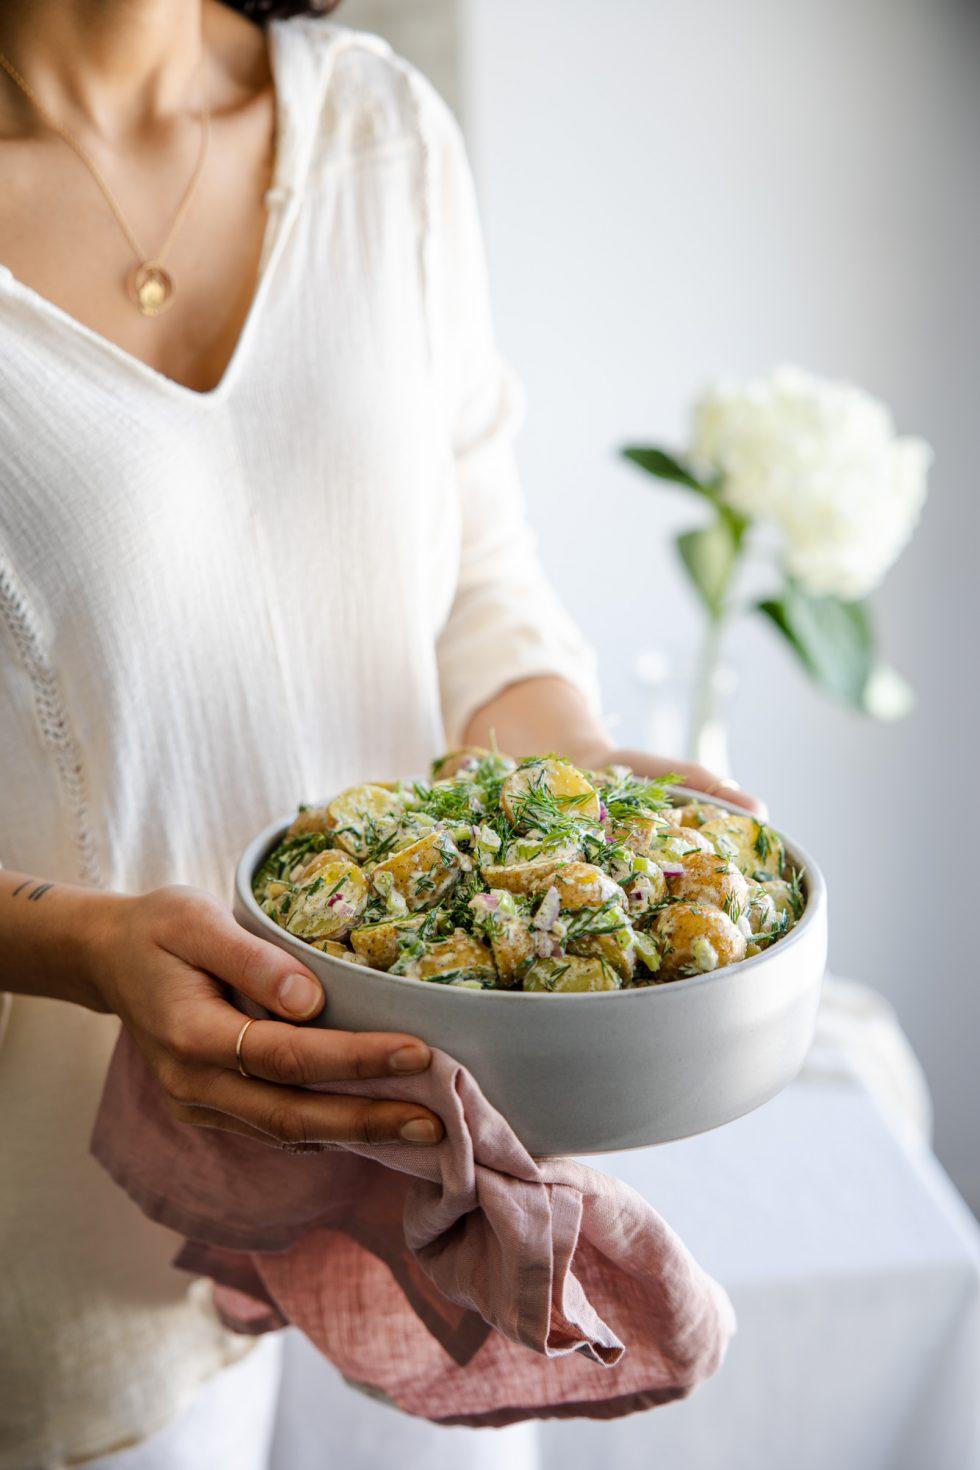 genevieve-plante-salad-book-food-lifestyle-photographer-laura-g-diaz-3